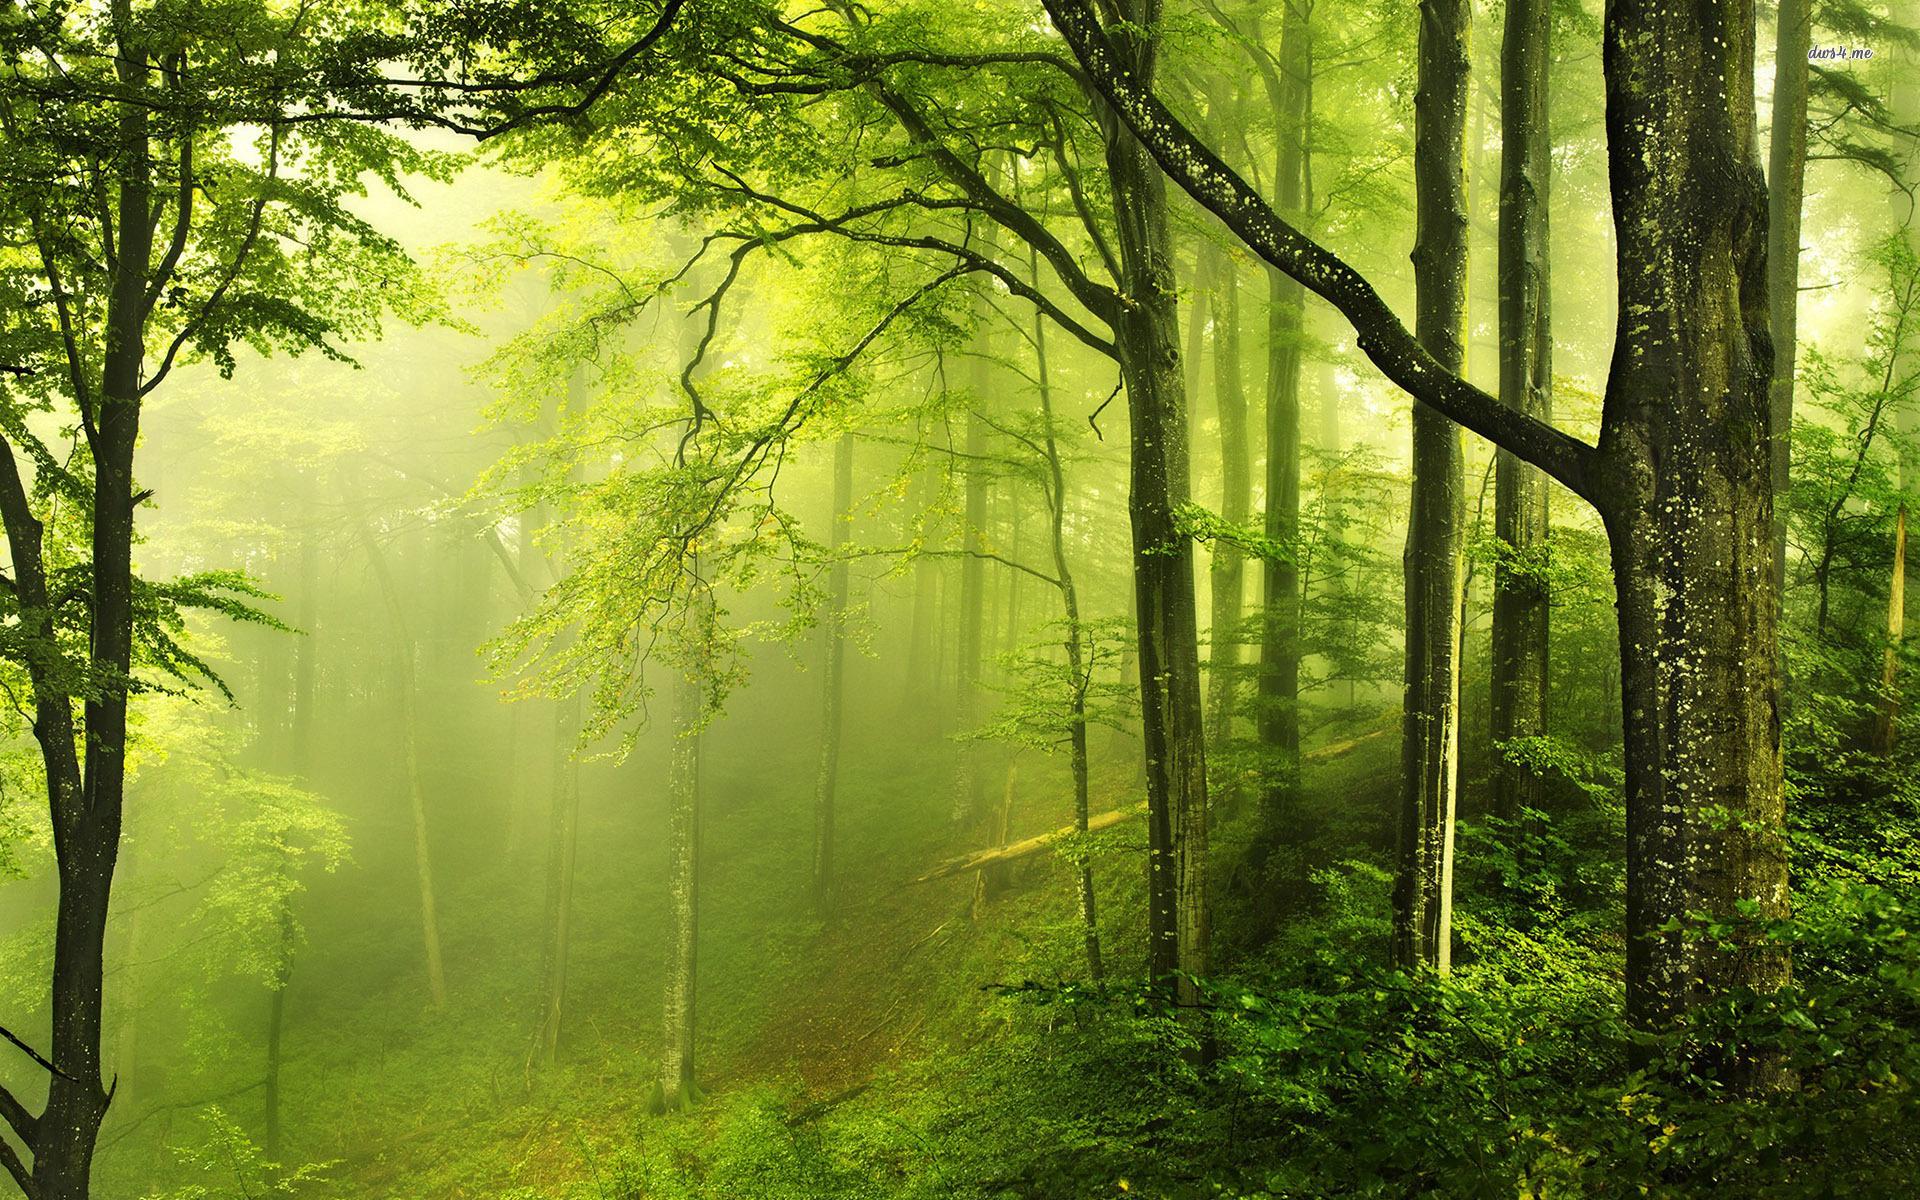 76 Forest Desktop Backgrounds On Wallpapersafari